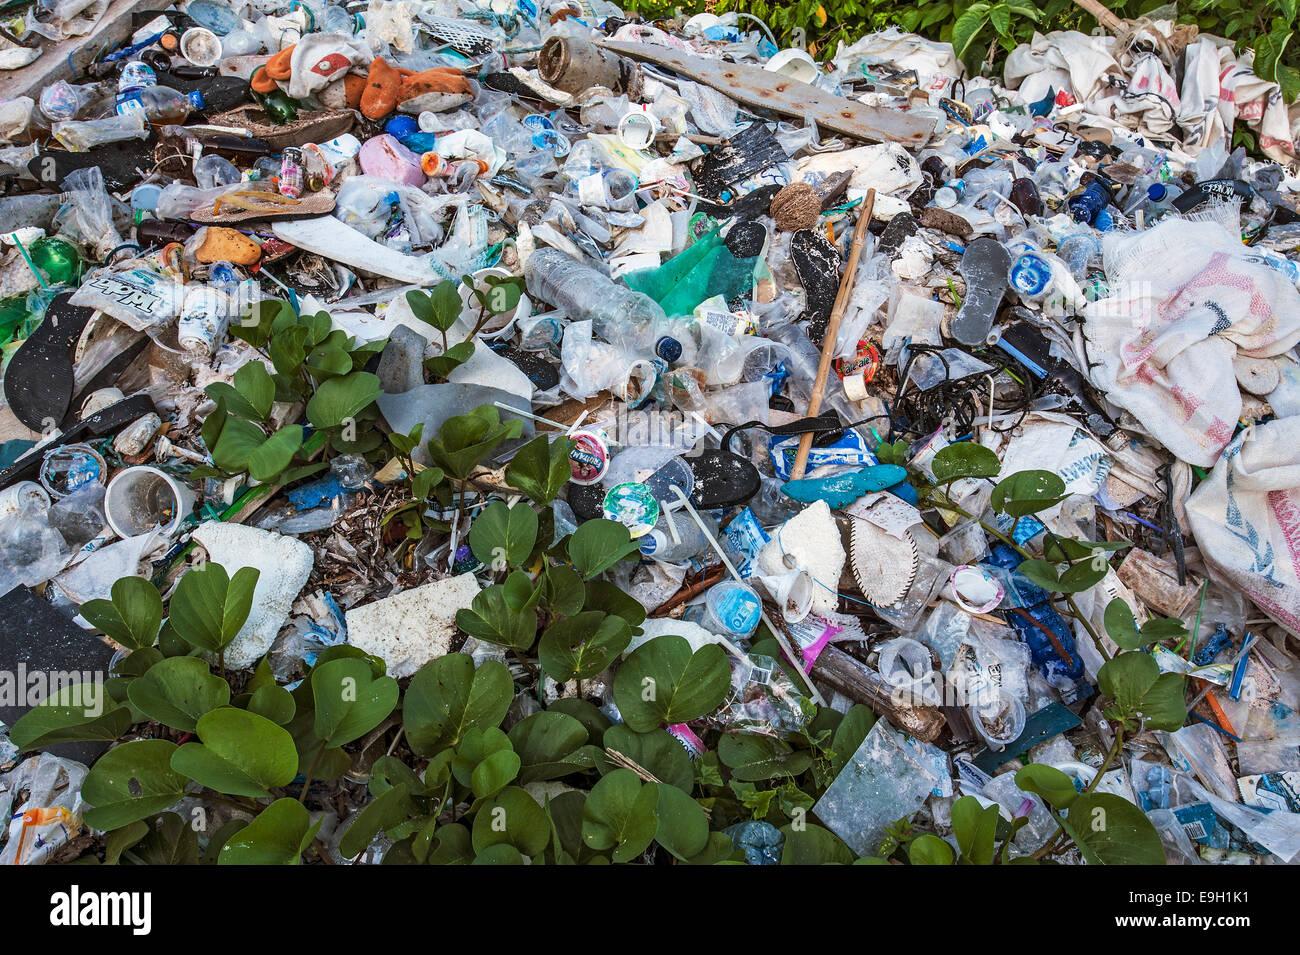 Waste heap, Wakatobi Dive Resort, Sulawesi, Indonesia - Stock Image